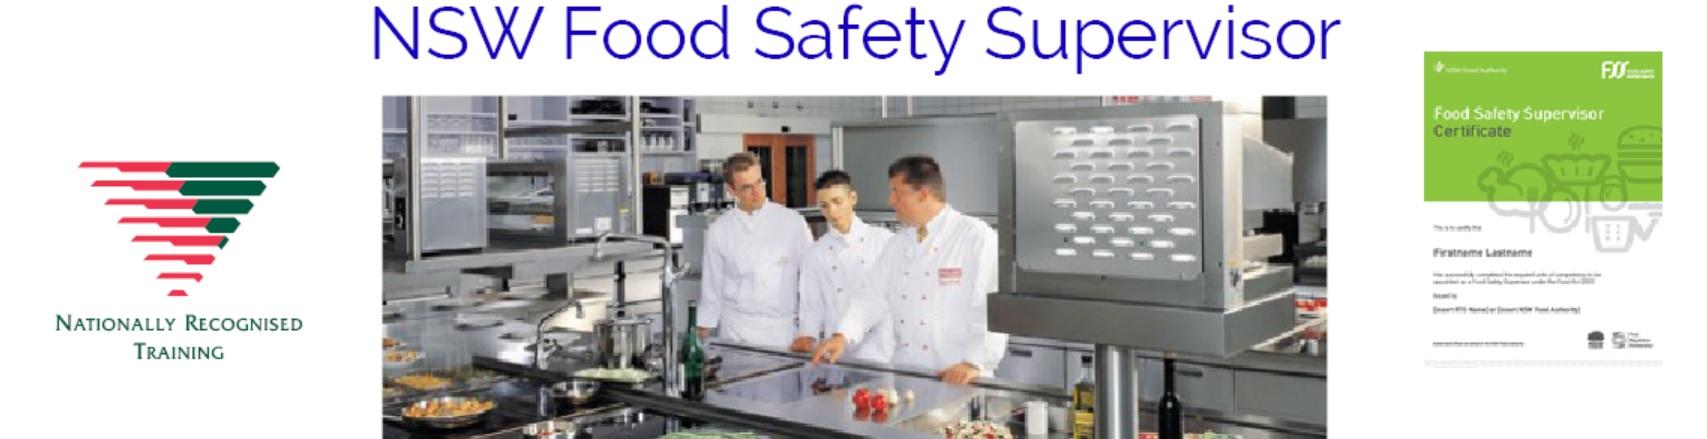 Fssnswonline 1 Food Safety Supervisor Nsw Online Coffee